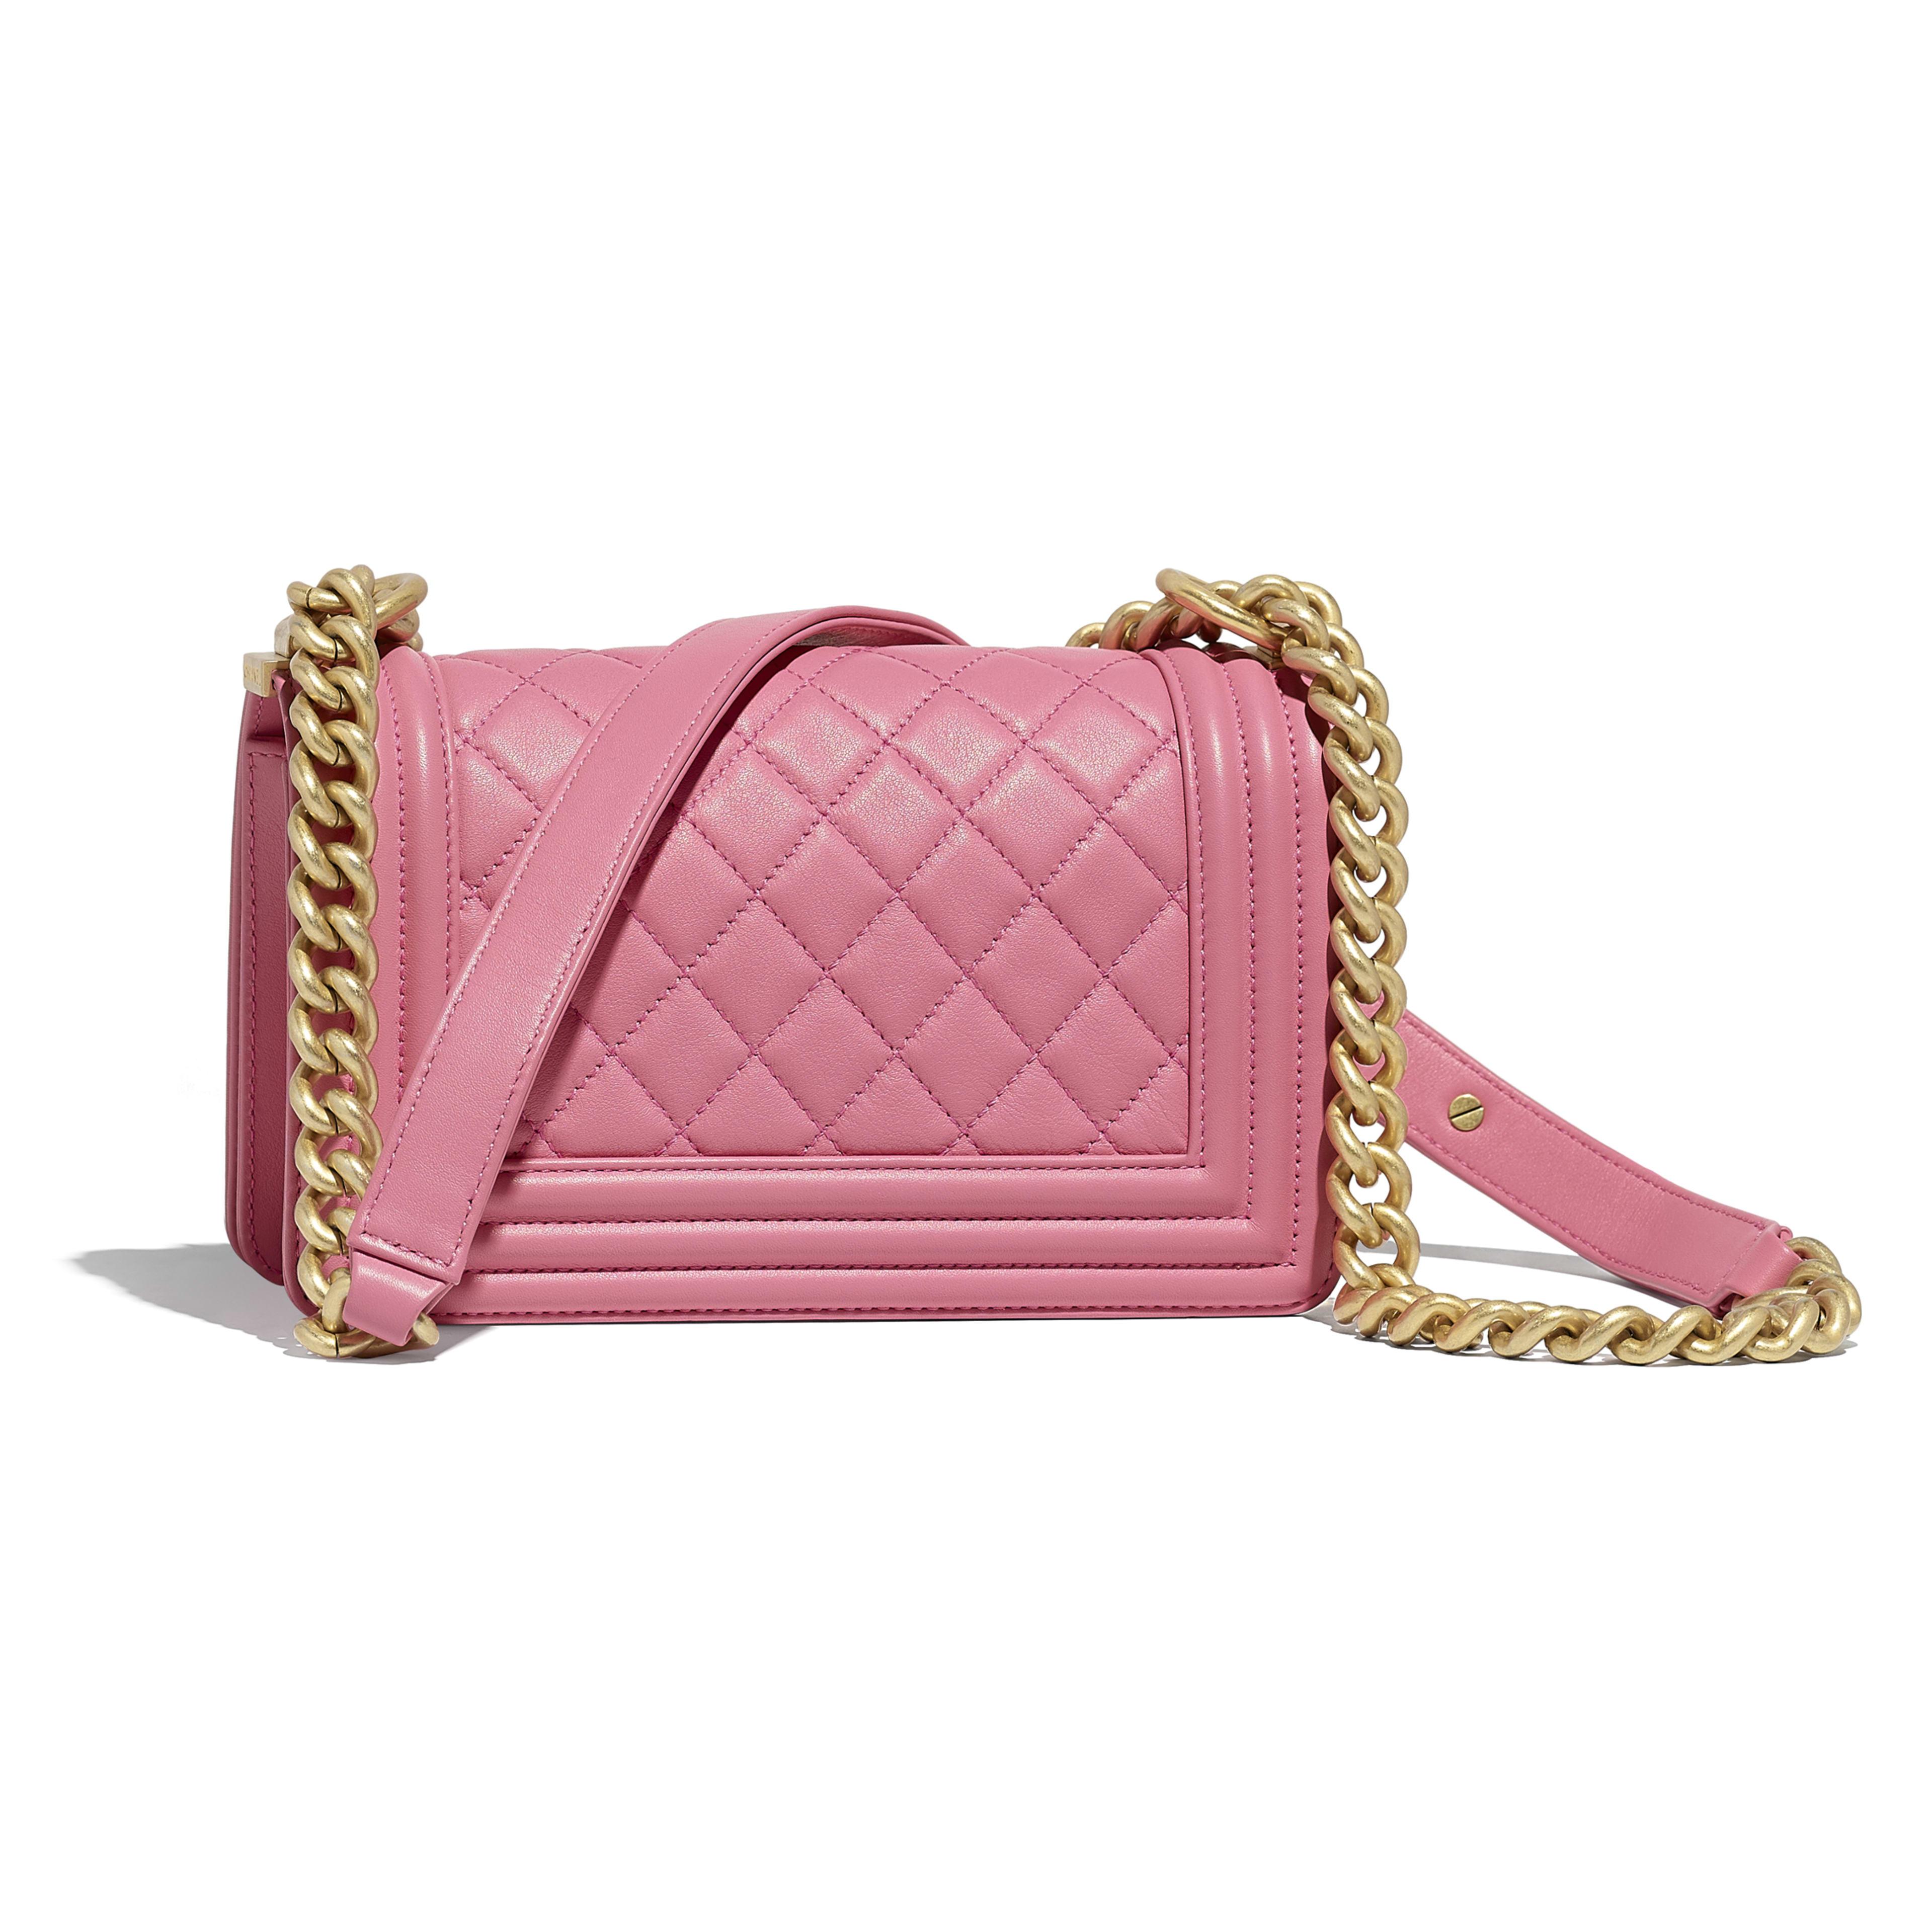 Small BOY CHANEL Handbag - Pink - Calfskin & Gold-Tone Metal - Alternative view - see full sized version